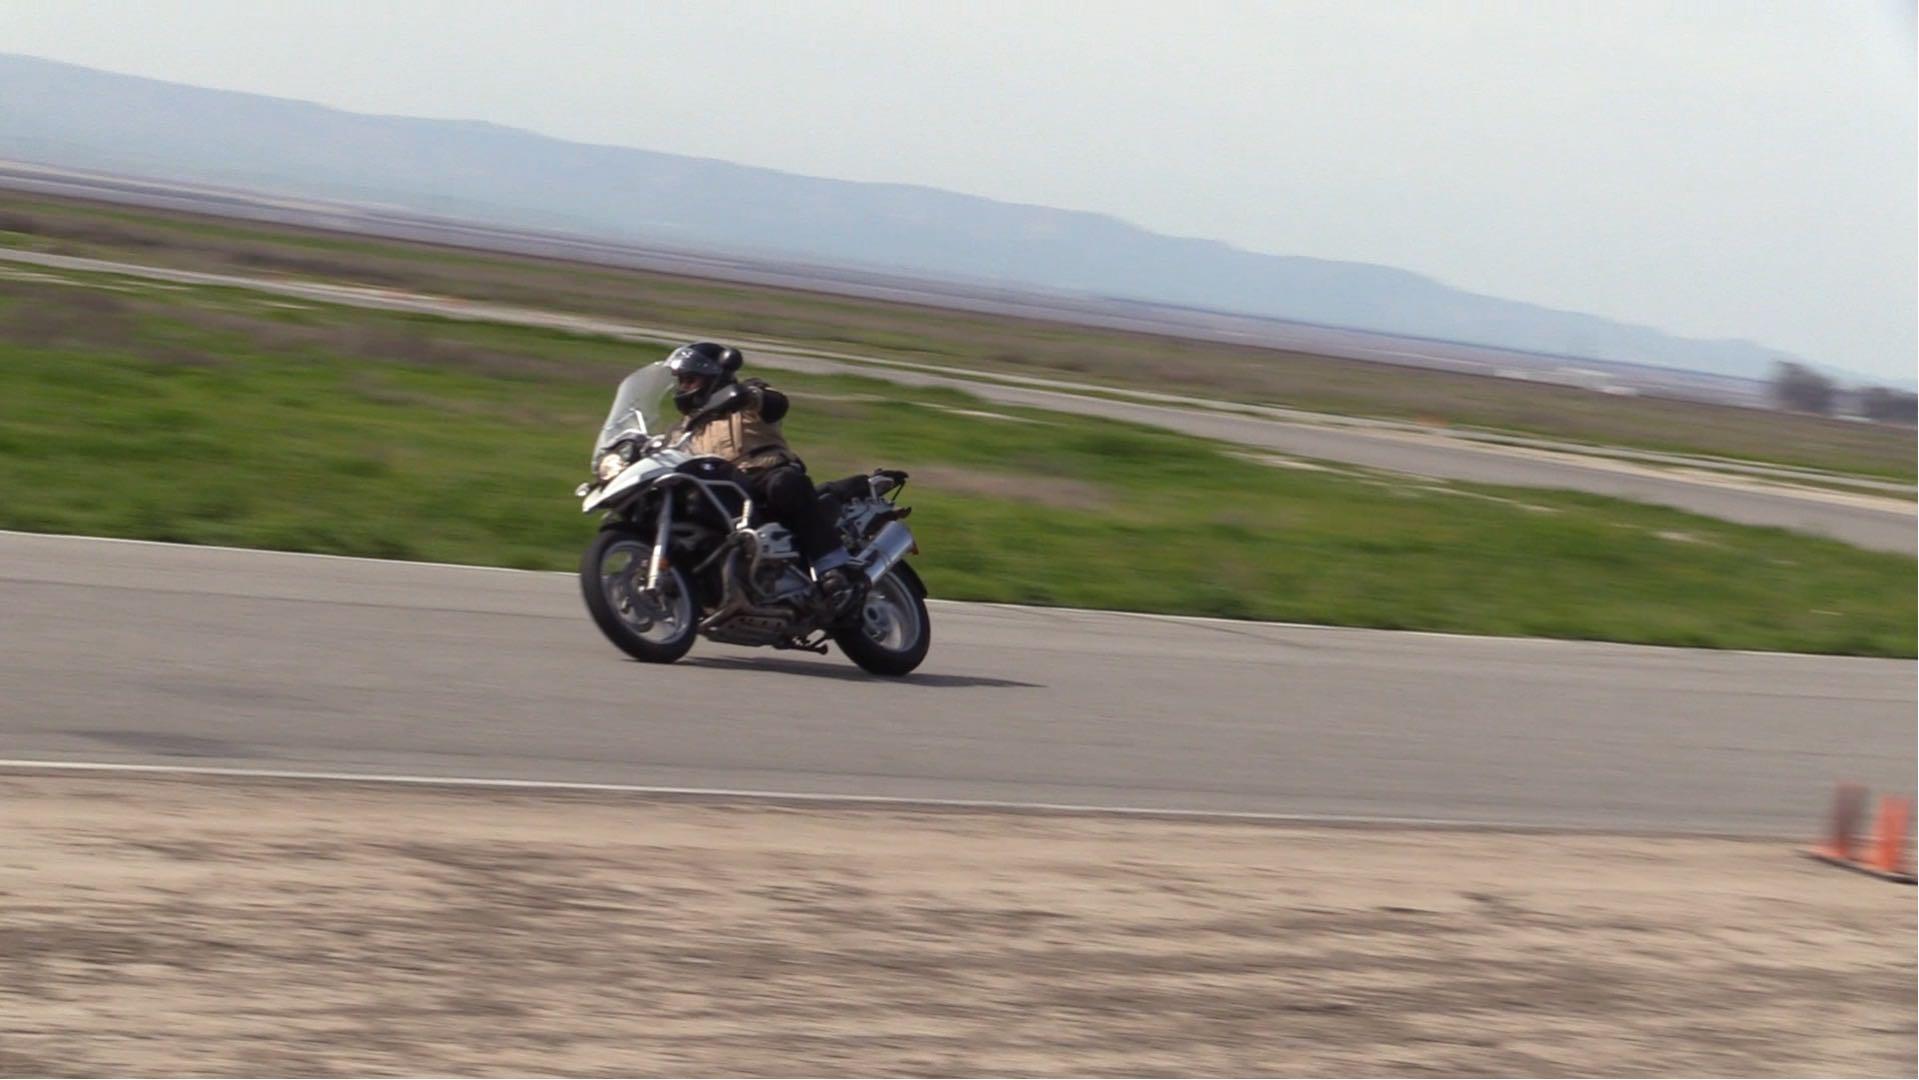 Yamaha Champions Riding School teaching